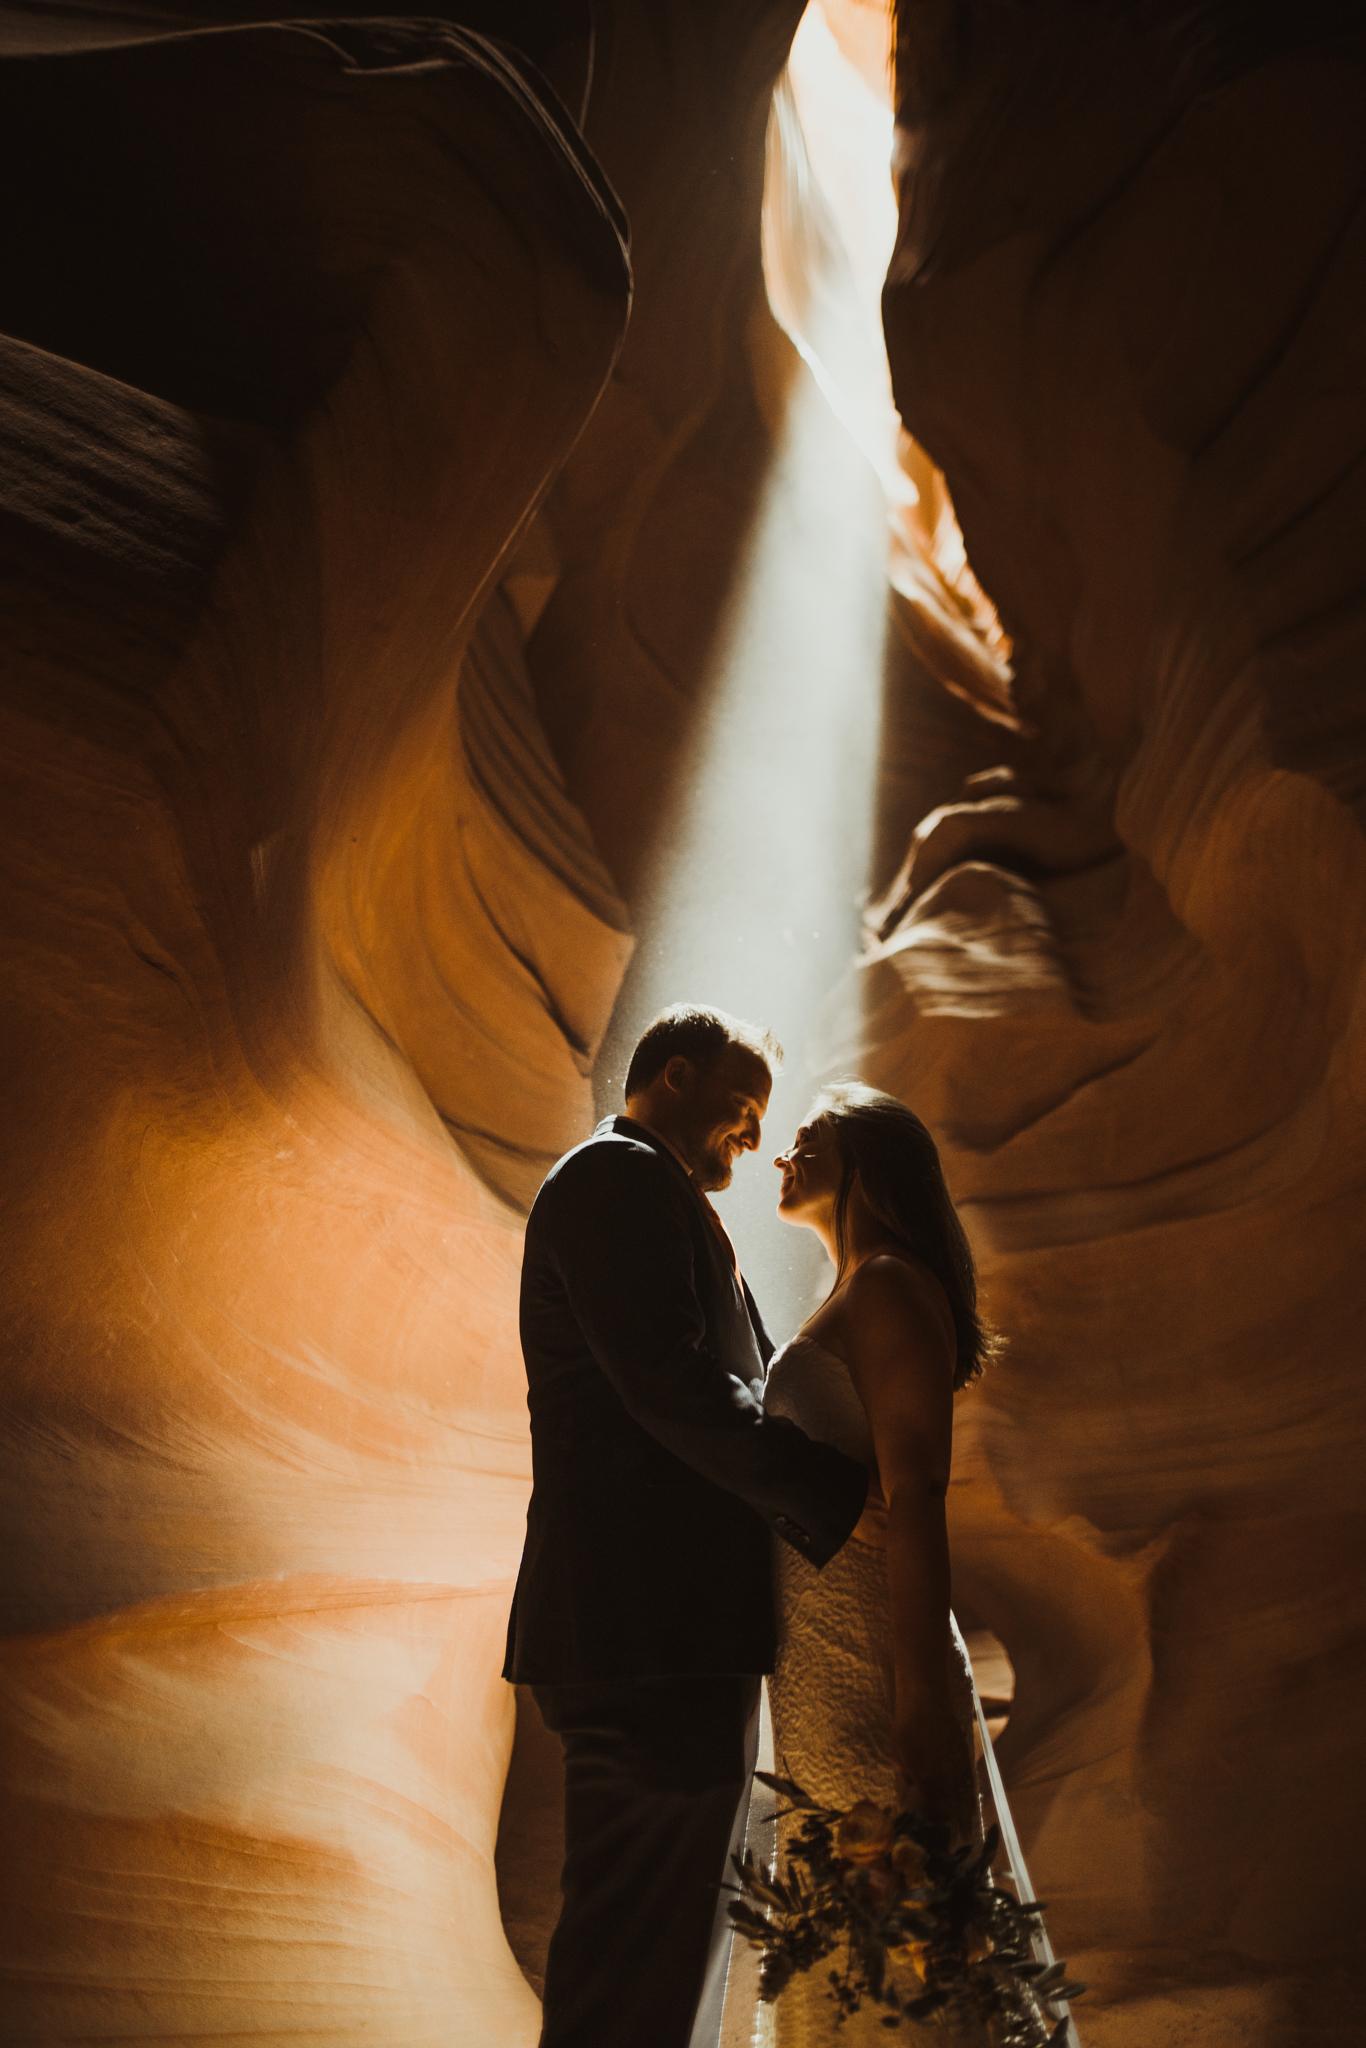 ©Isaiah + Taylor Photography - Lake Powell Elopement & Antelope Canyon & Horseshoe Bend, Page, Arizona-85.jpg